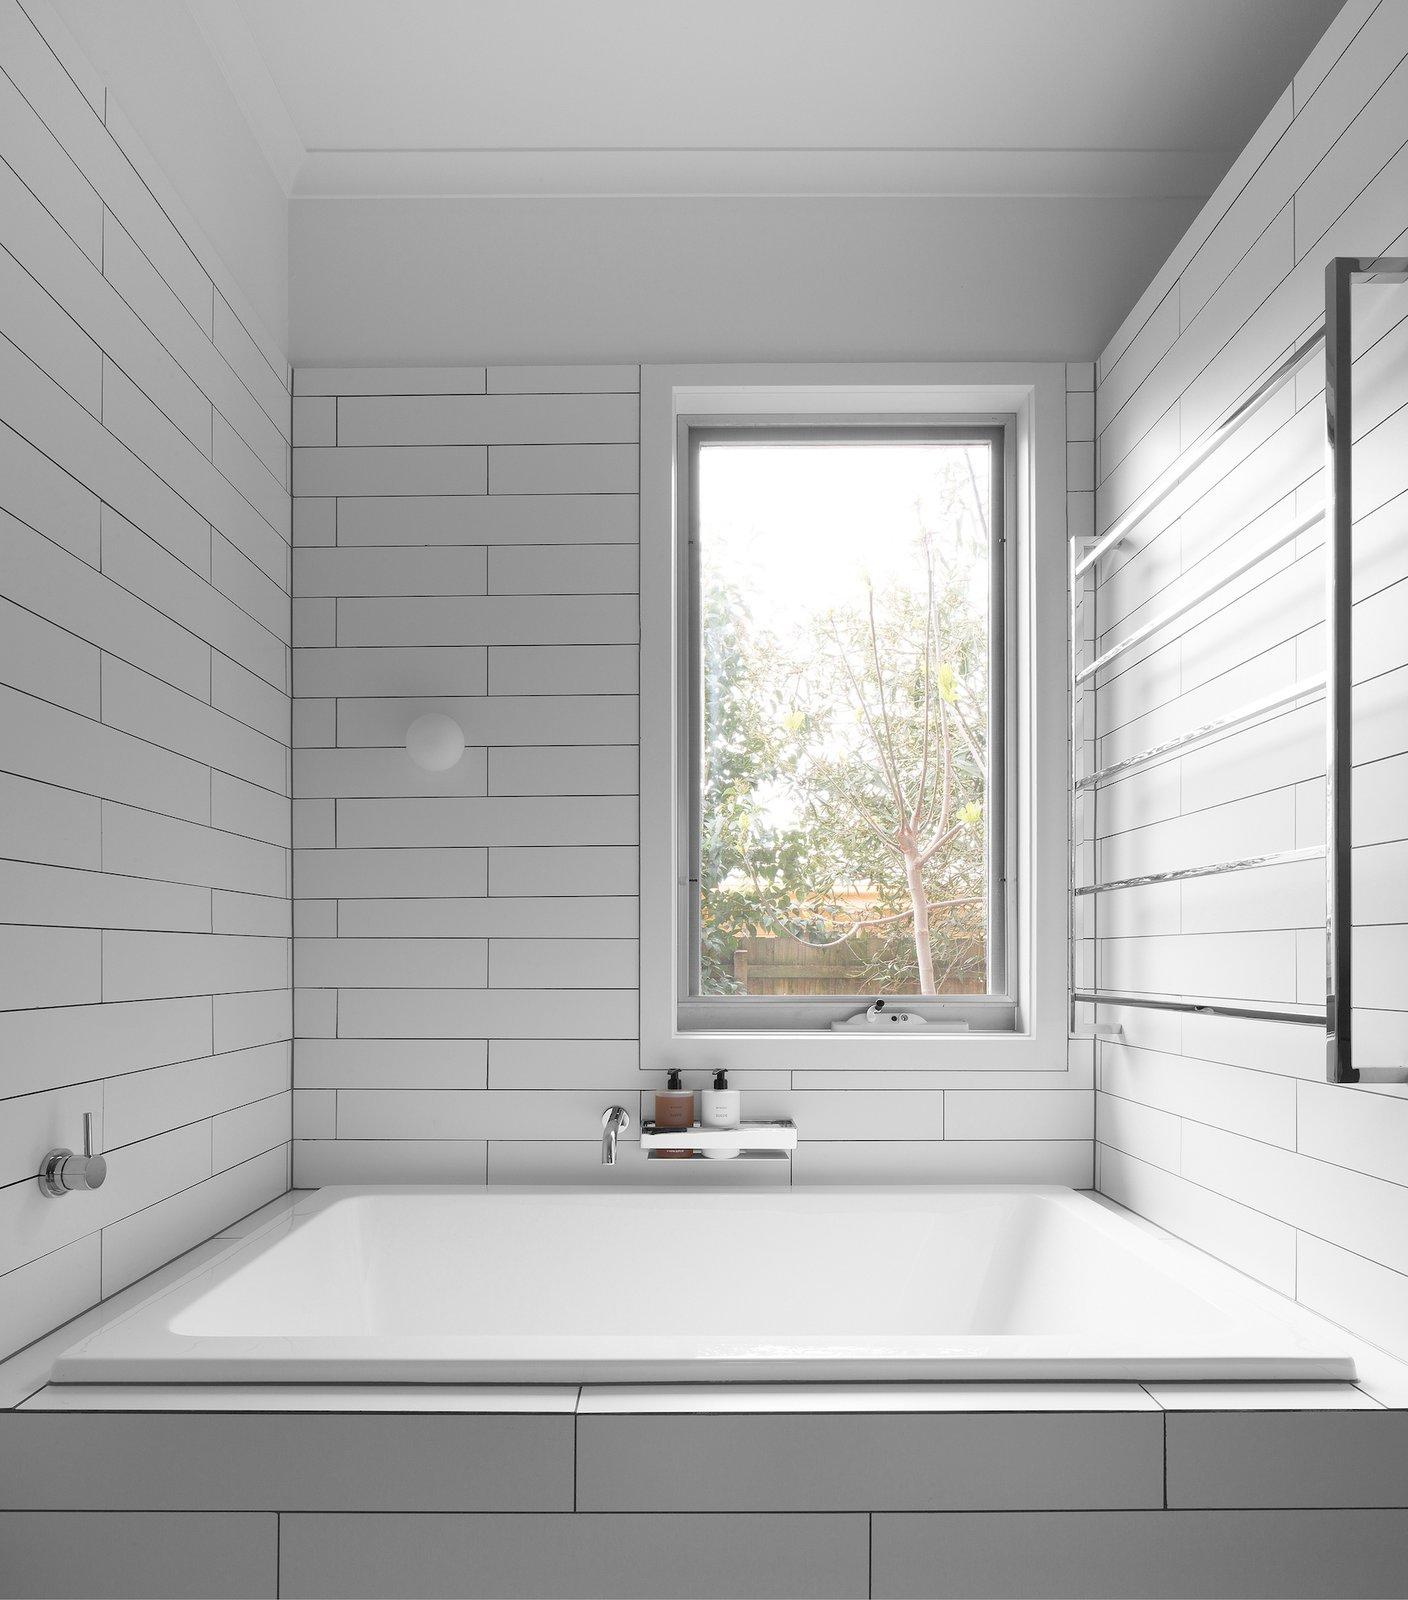 Tagged: Bath Room, Alcove Tub, Soaking Tub, and Ceramic Tile Wall.  Corhampton Rd Residence by Leibal